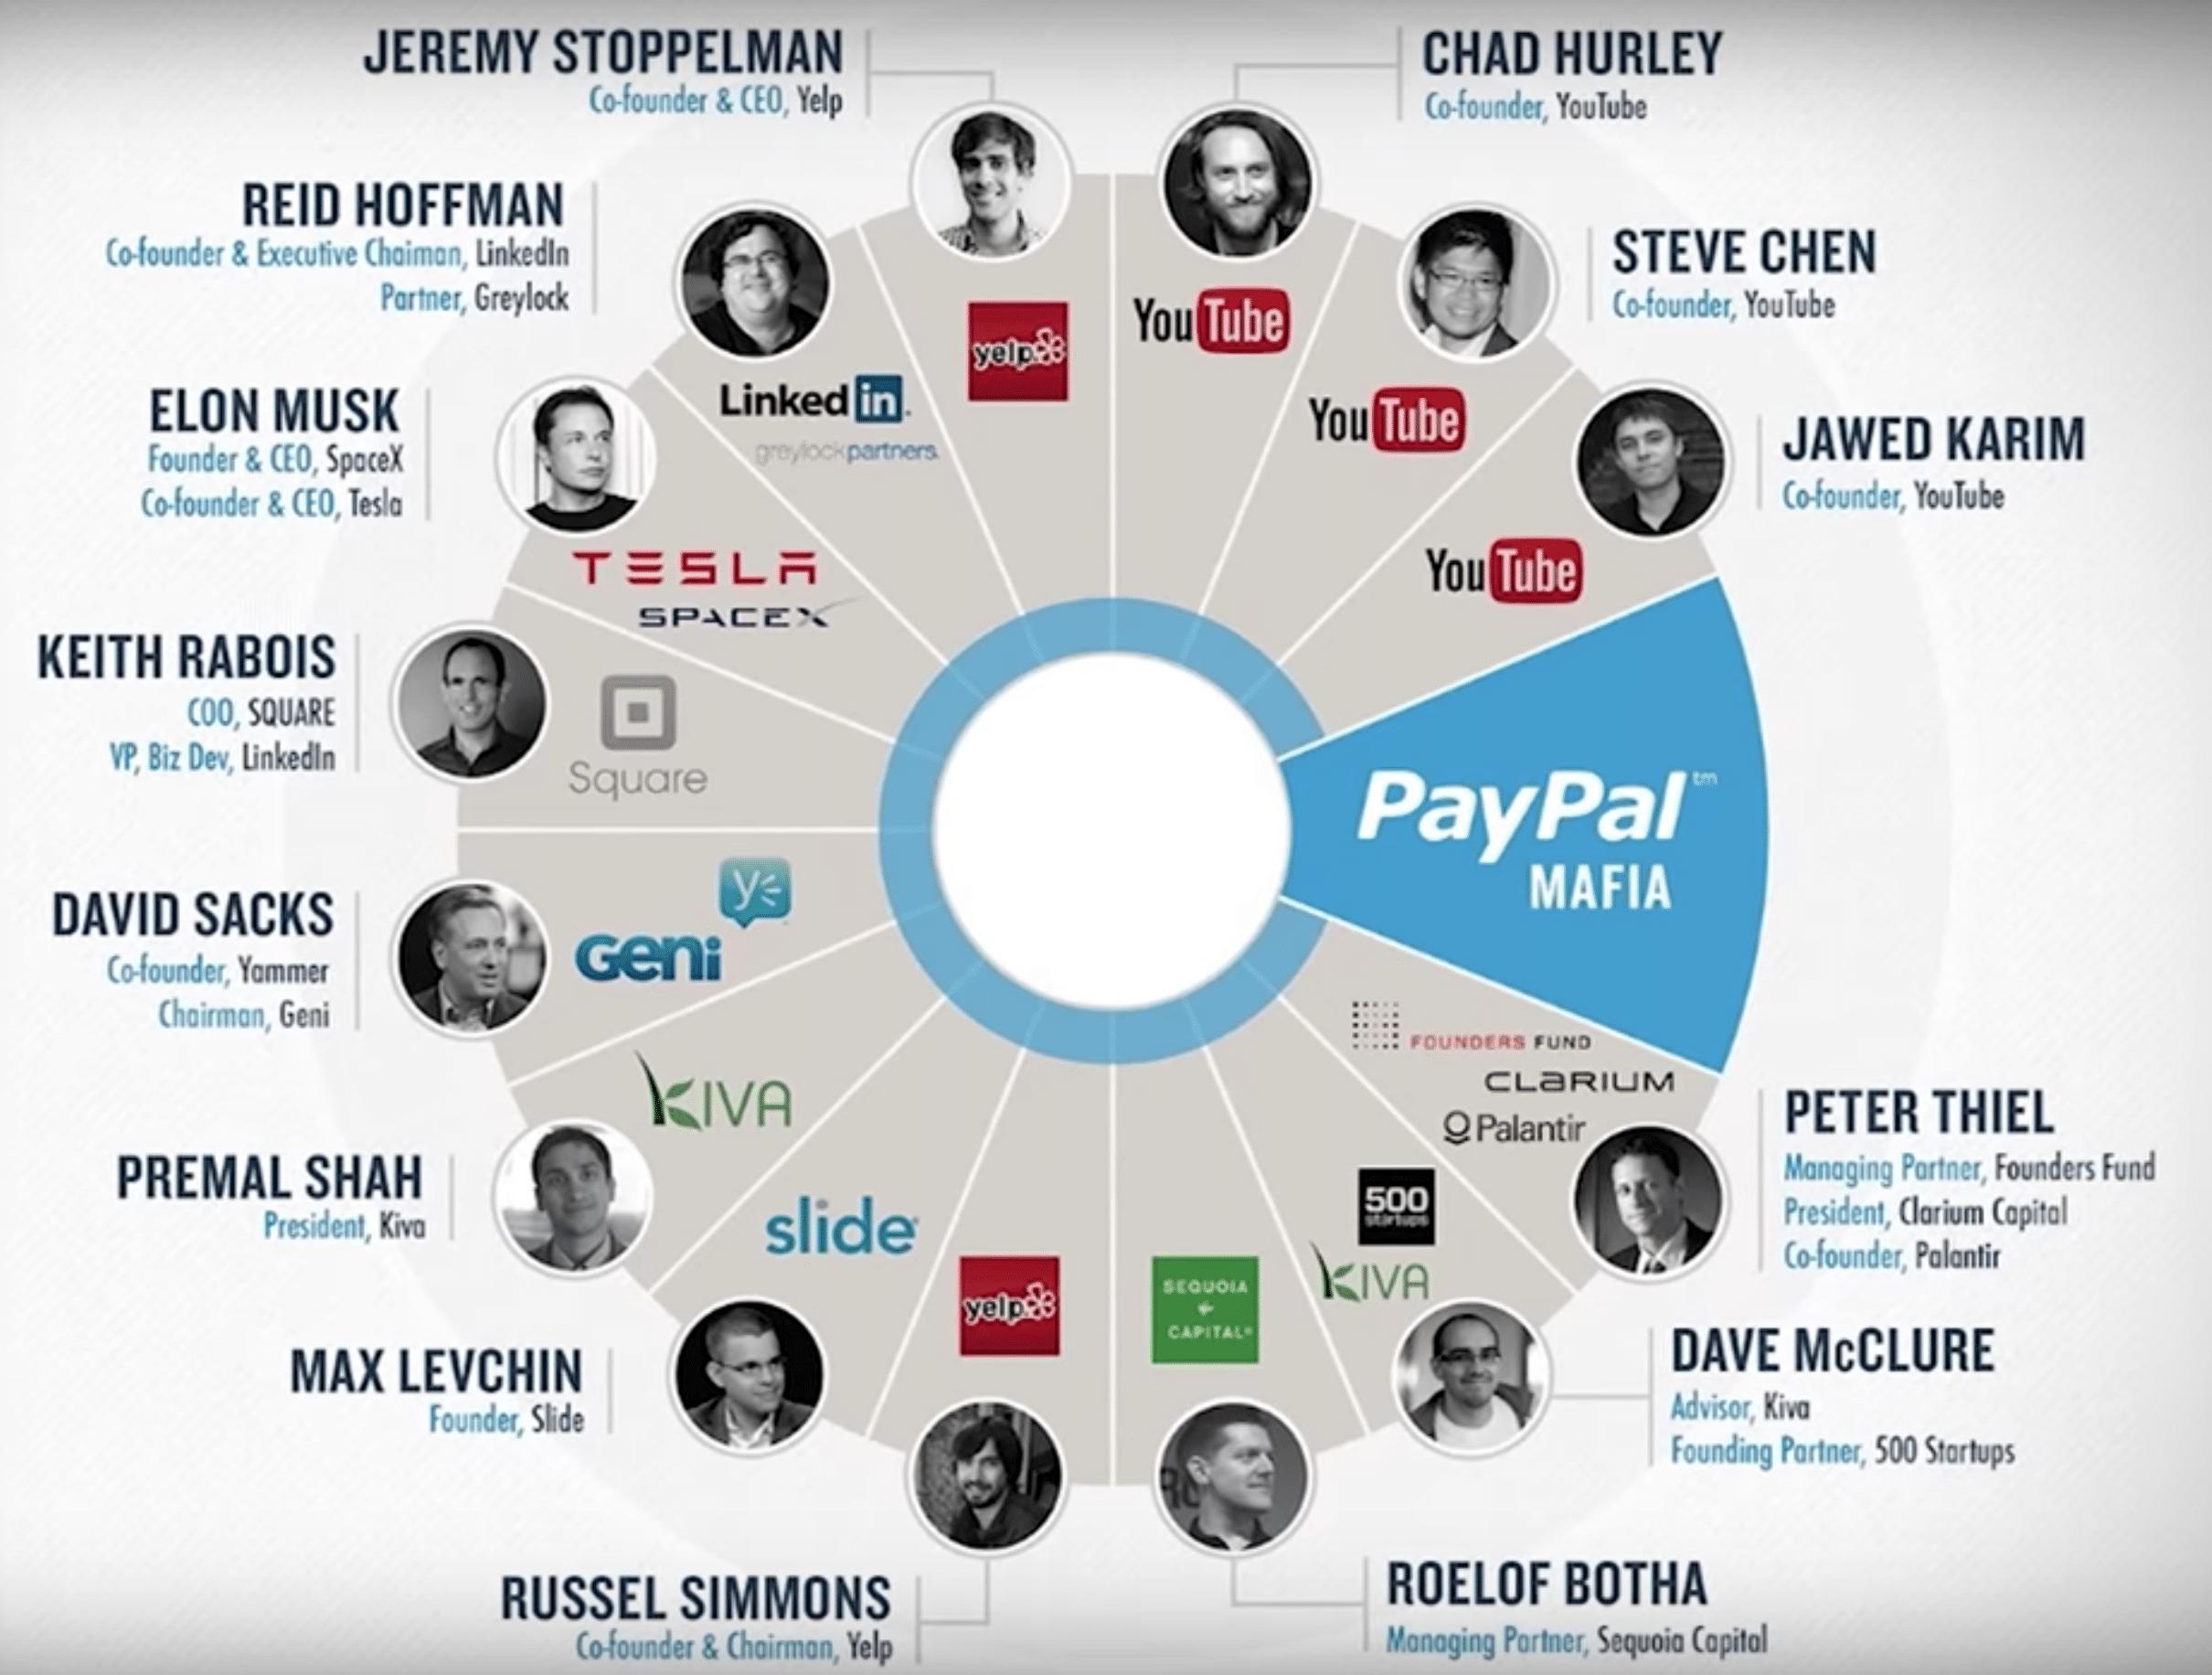 La mafia de PayPal